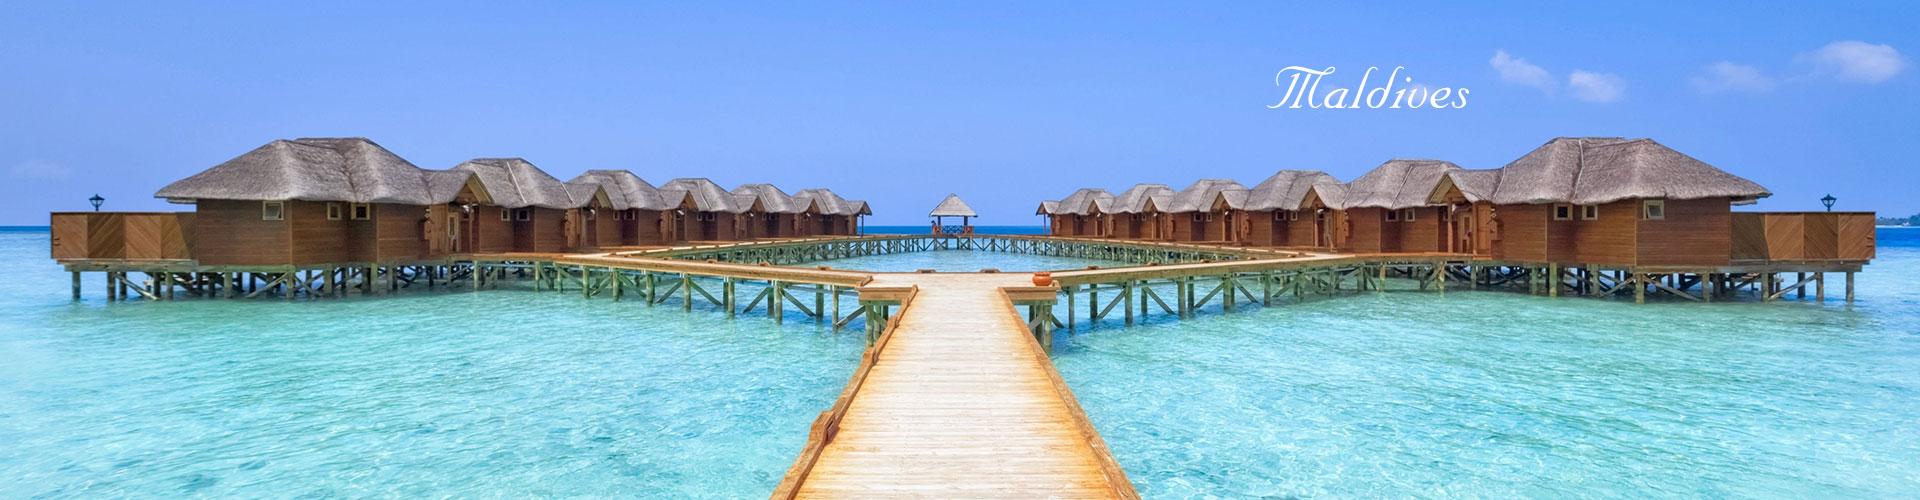 Maldives_en.jpg